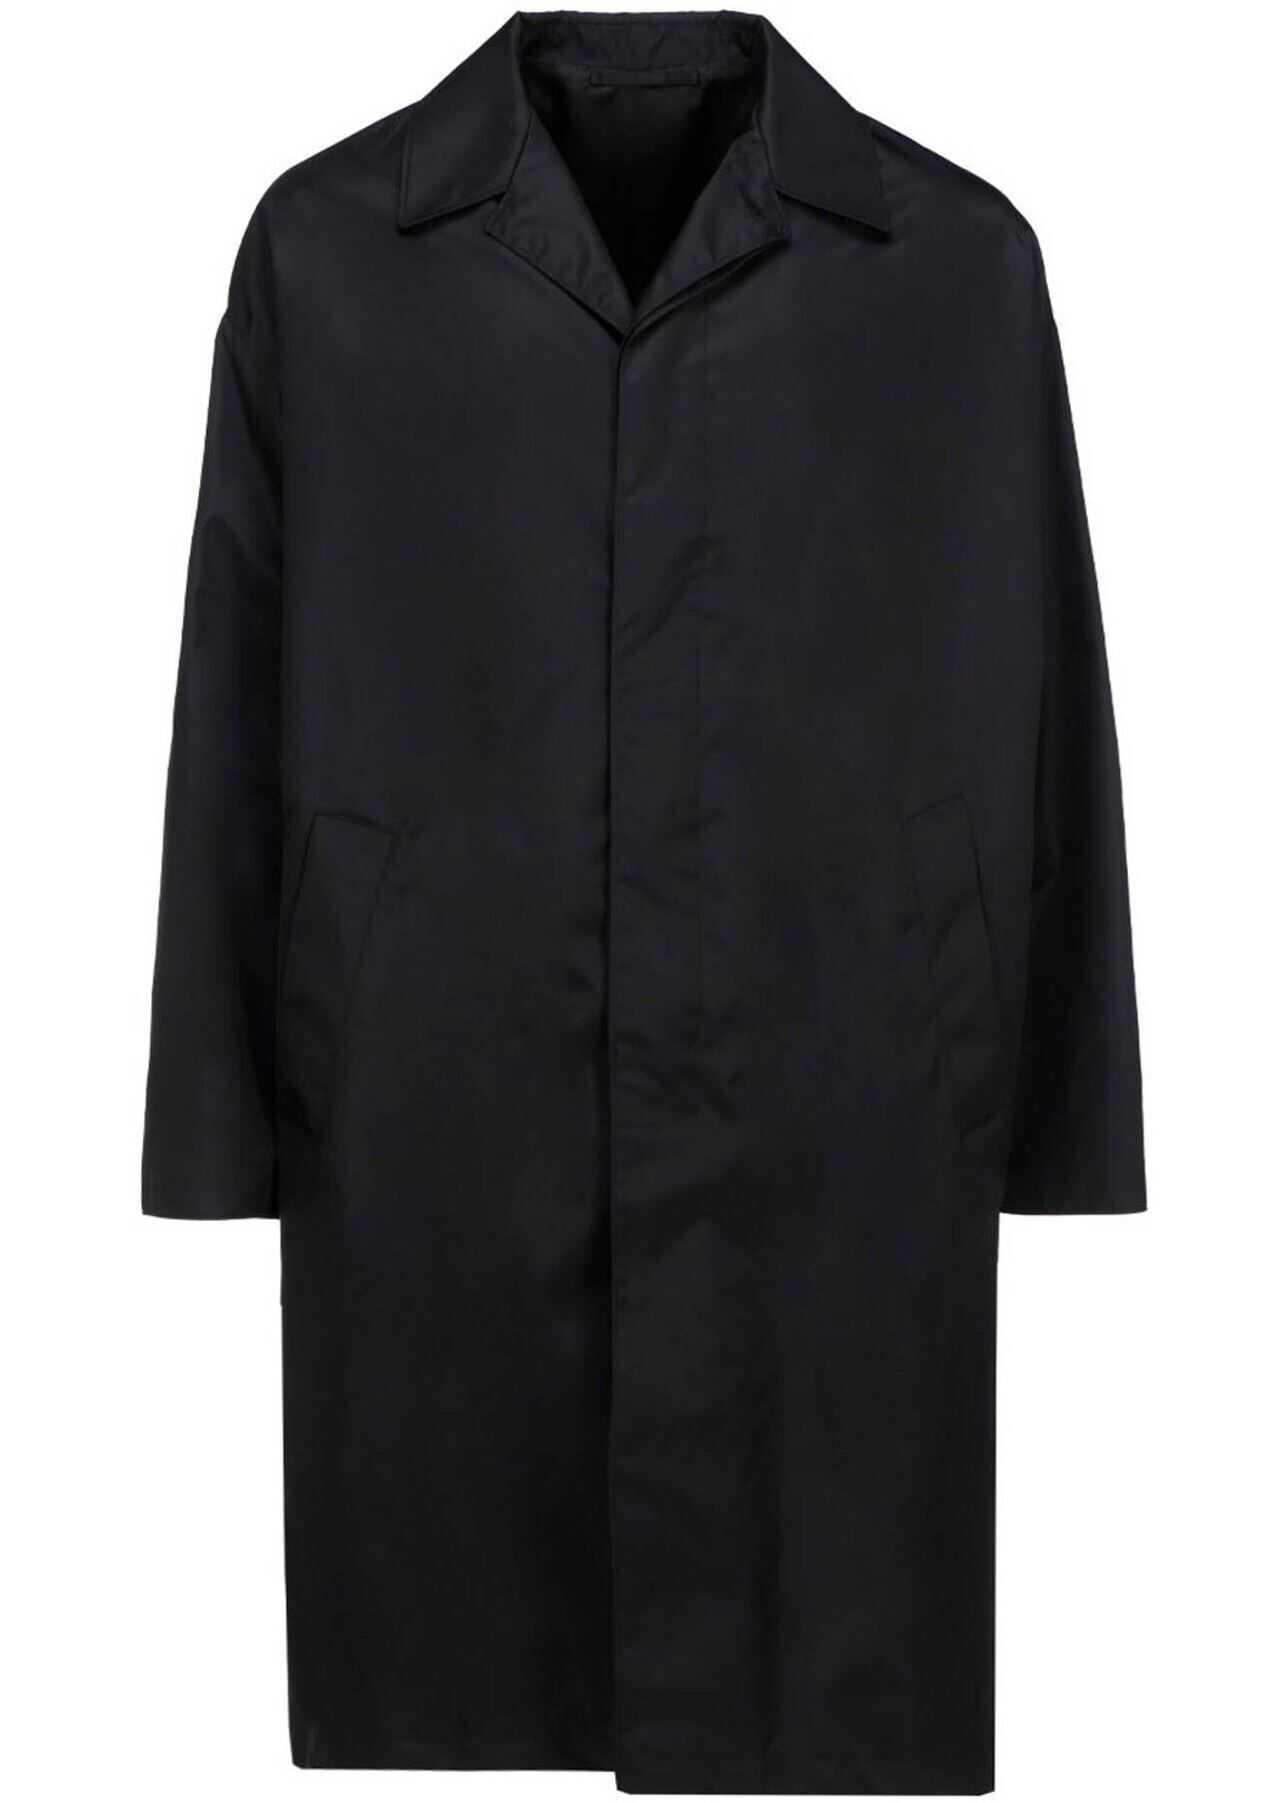 Prada Recycled Fabric Waterproof Coat In Black Black imagine